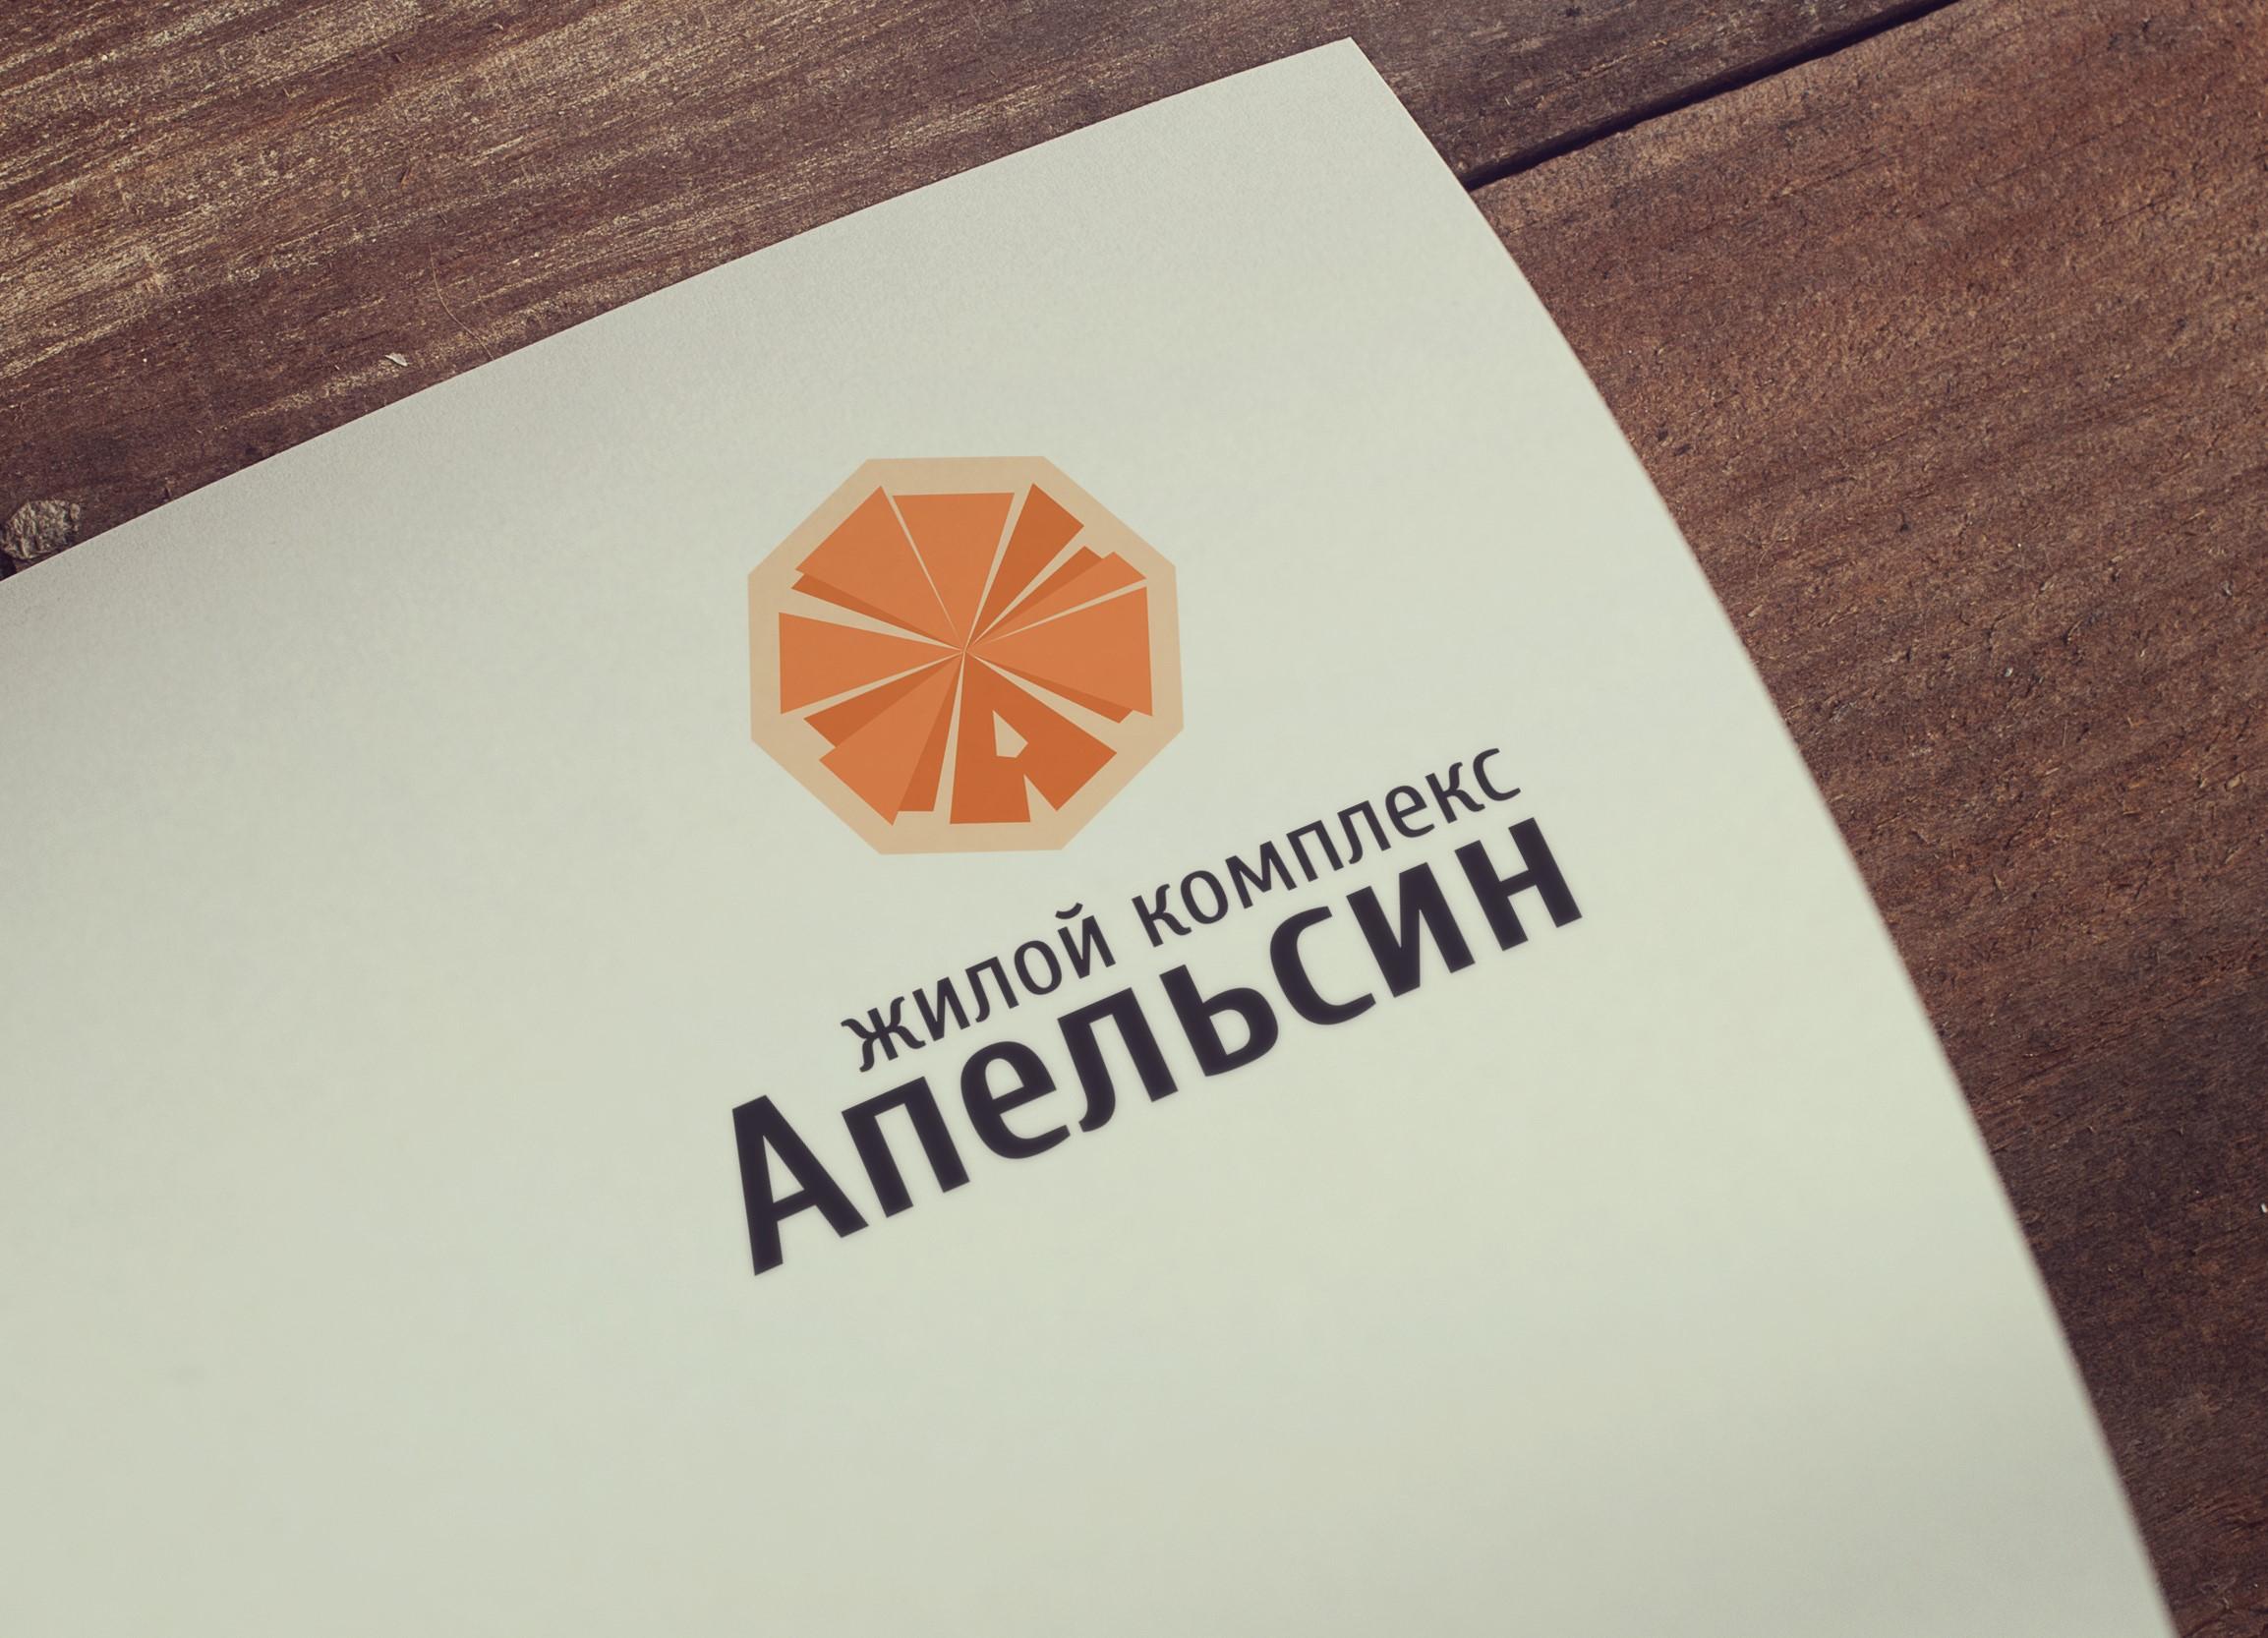 Логотип и фирменный стиль фото f_9655a633fd969df1.jpg